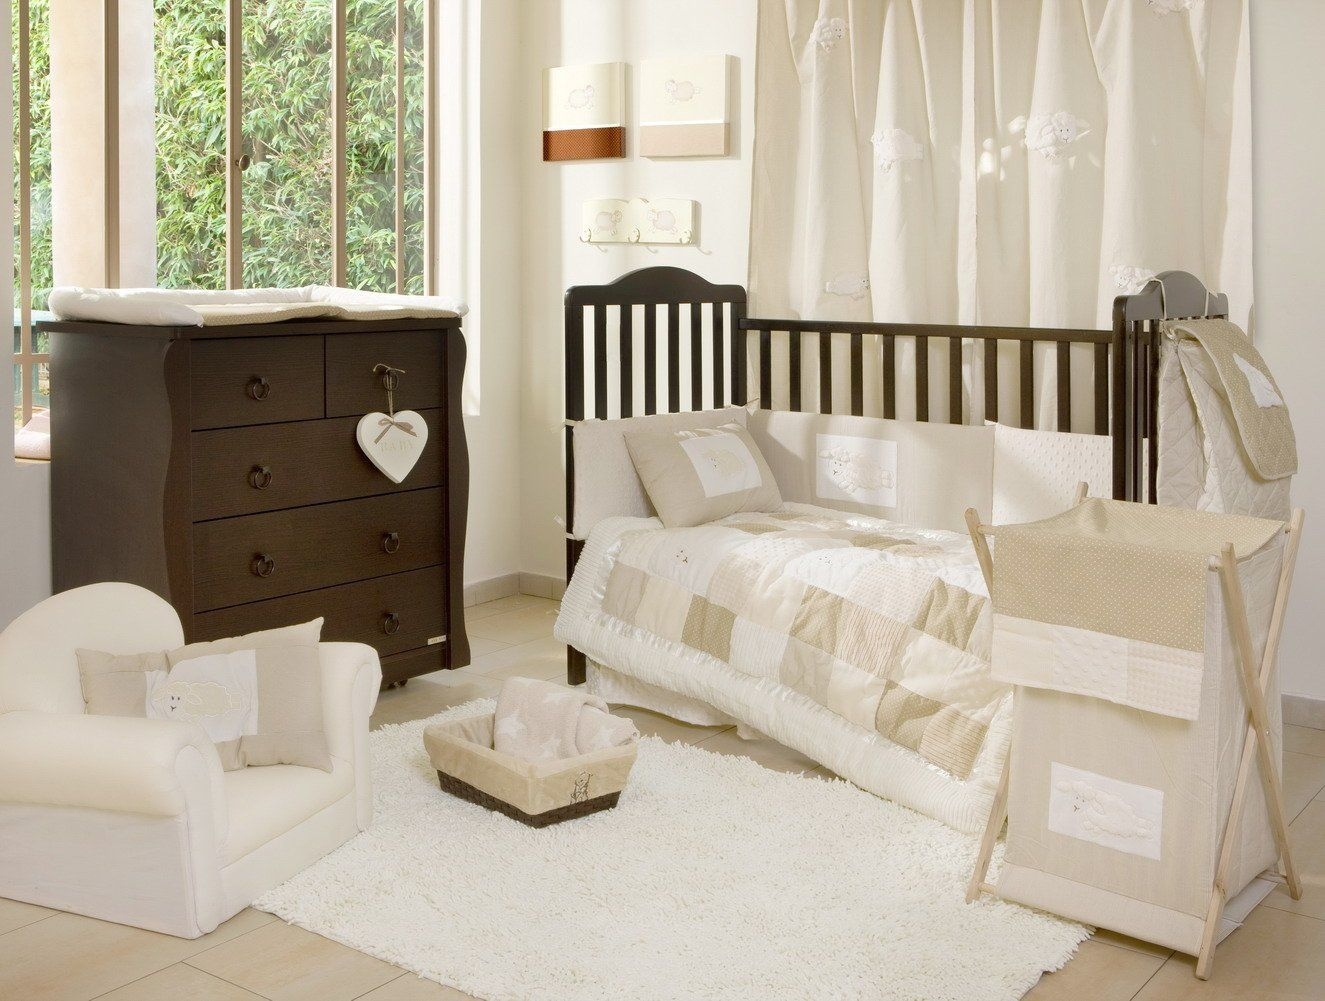 Beige Cream And White Bedroom Decorating Ideas White Crib